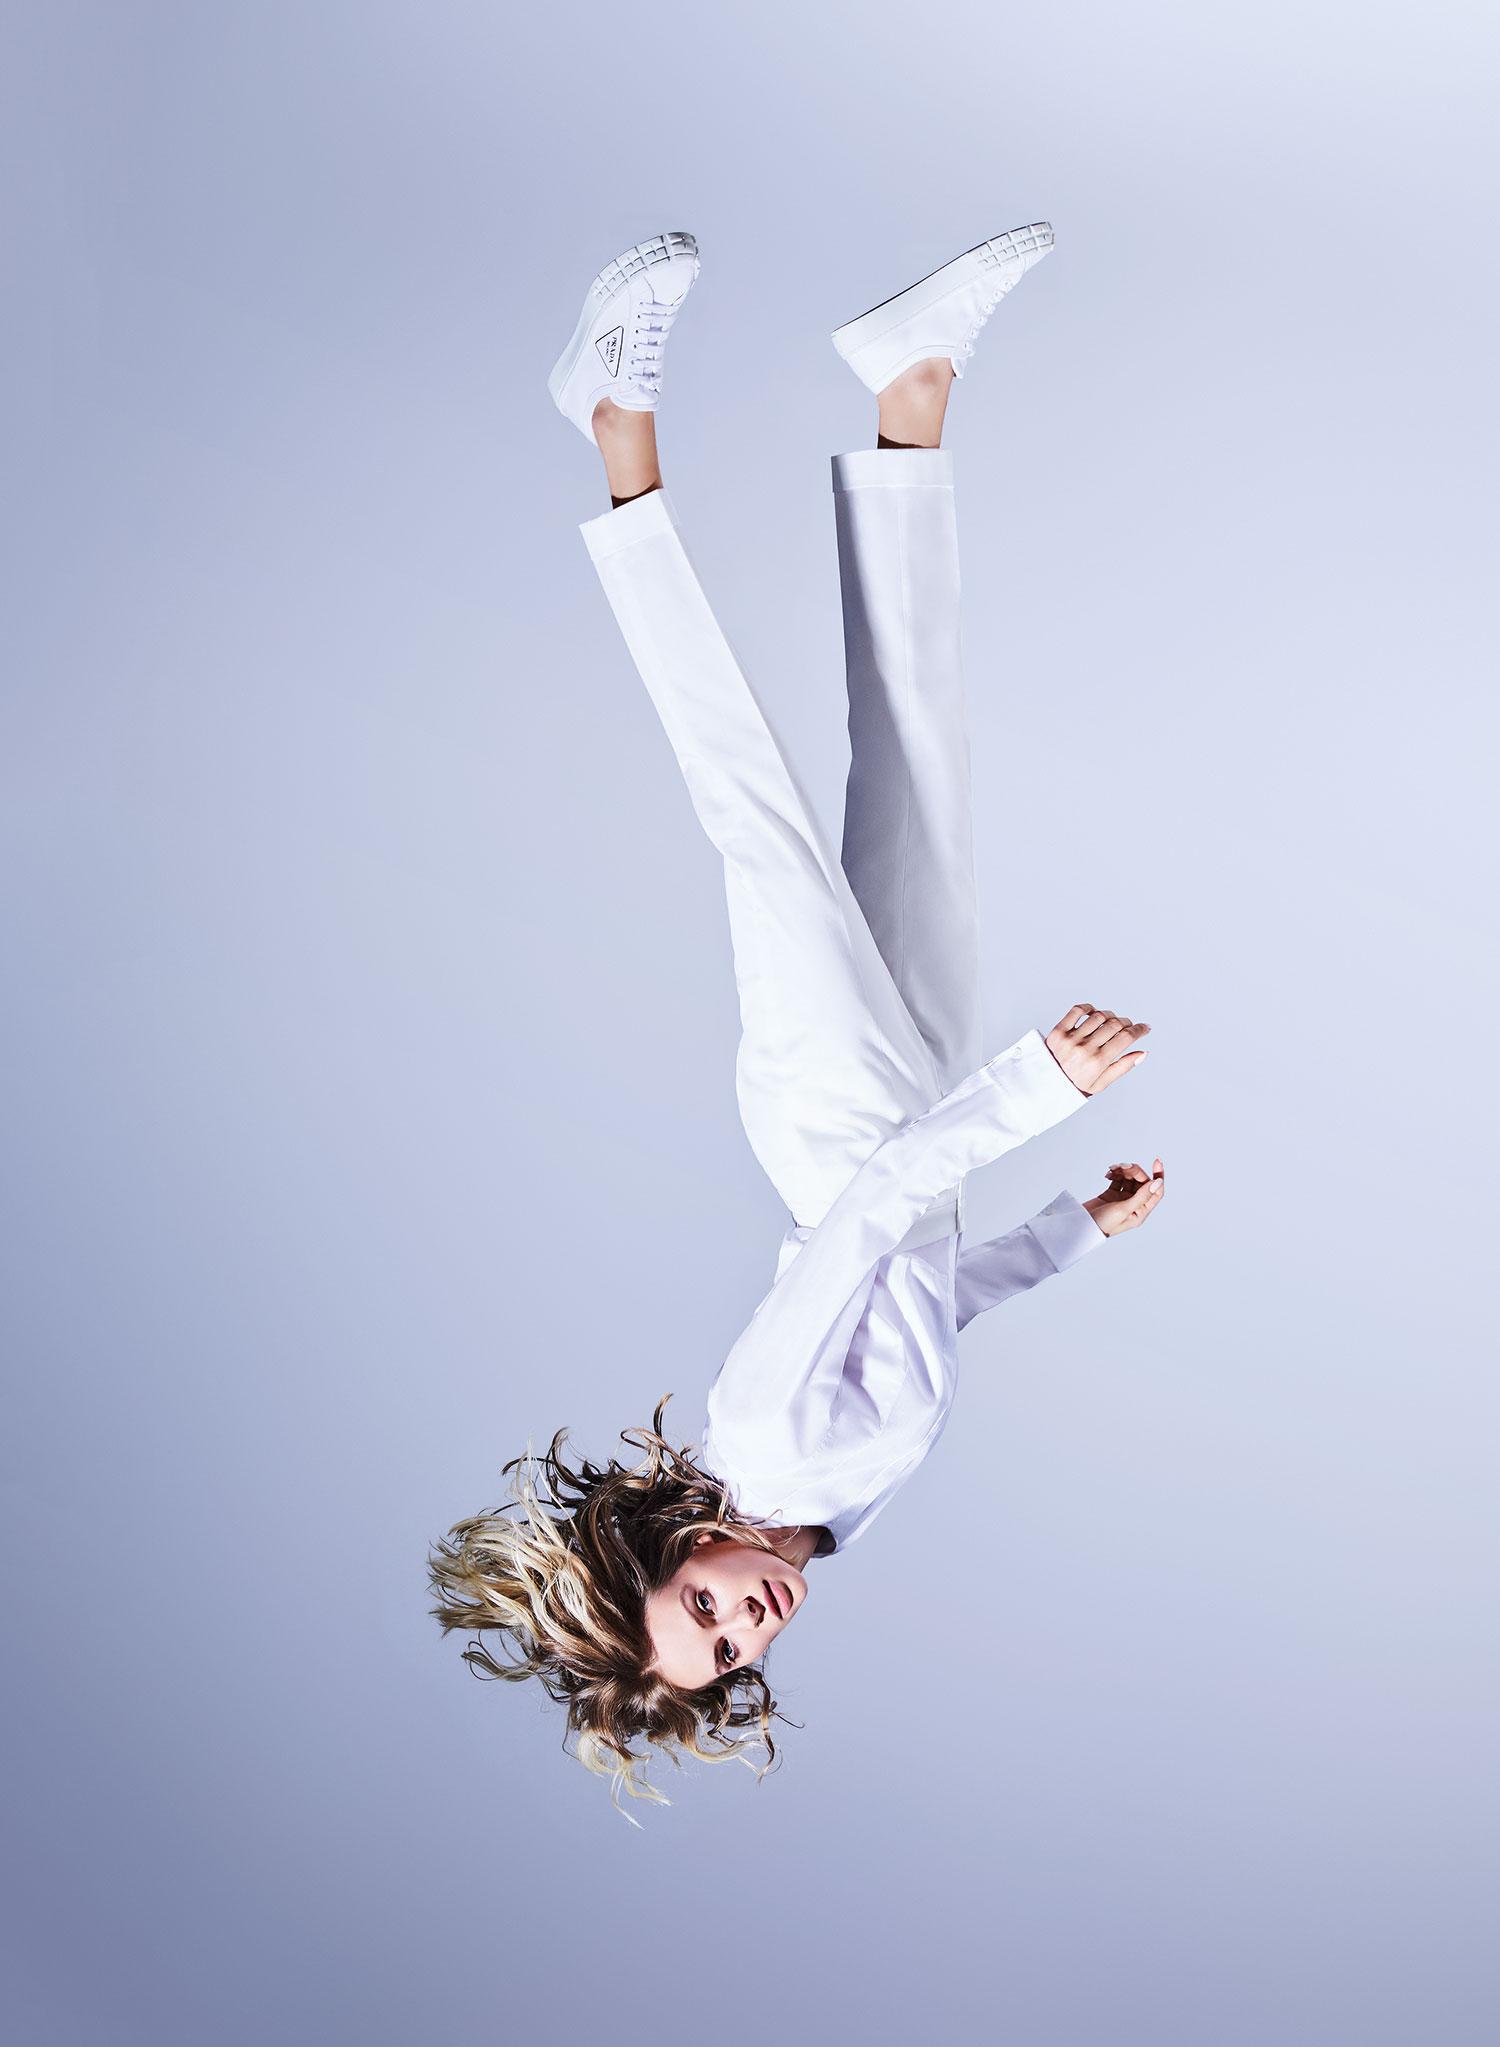 Рубашка Dior; брюки Etro; кеды Prada